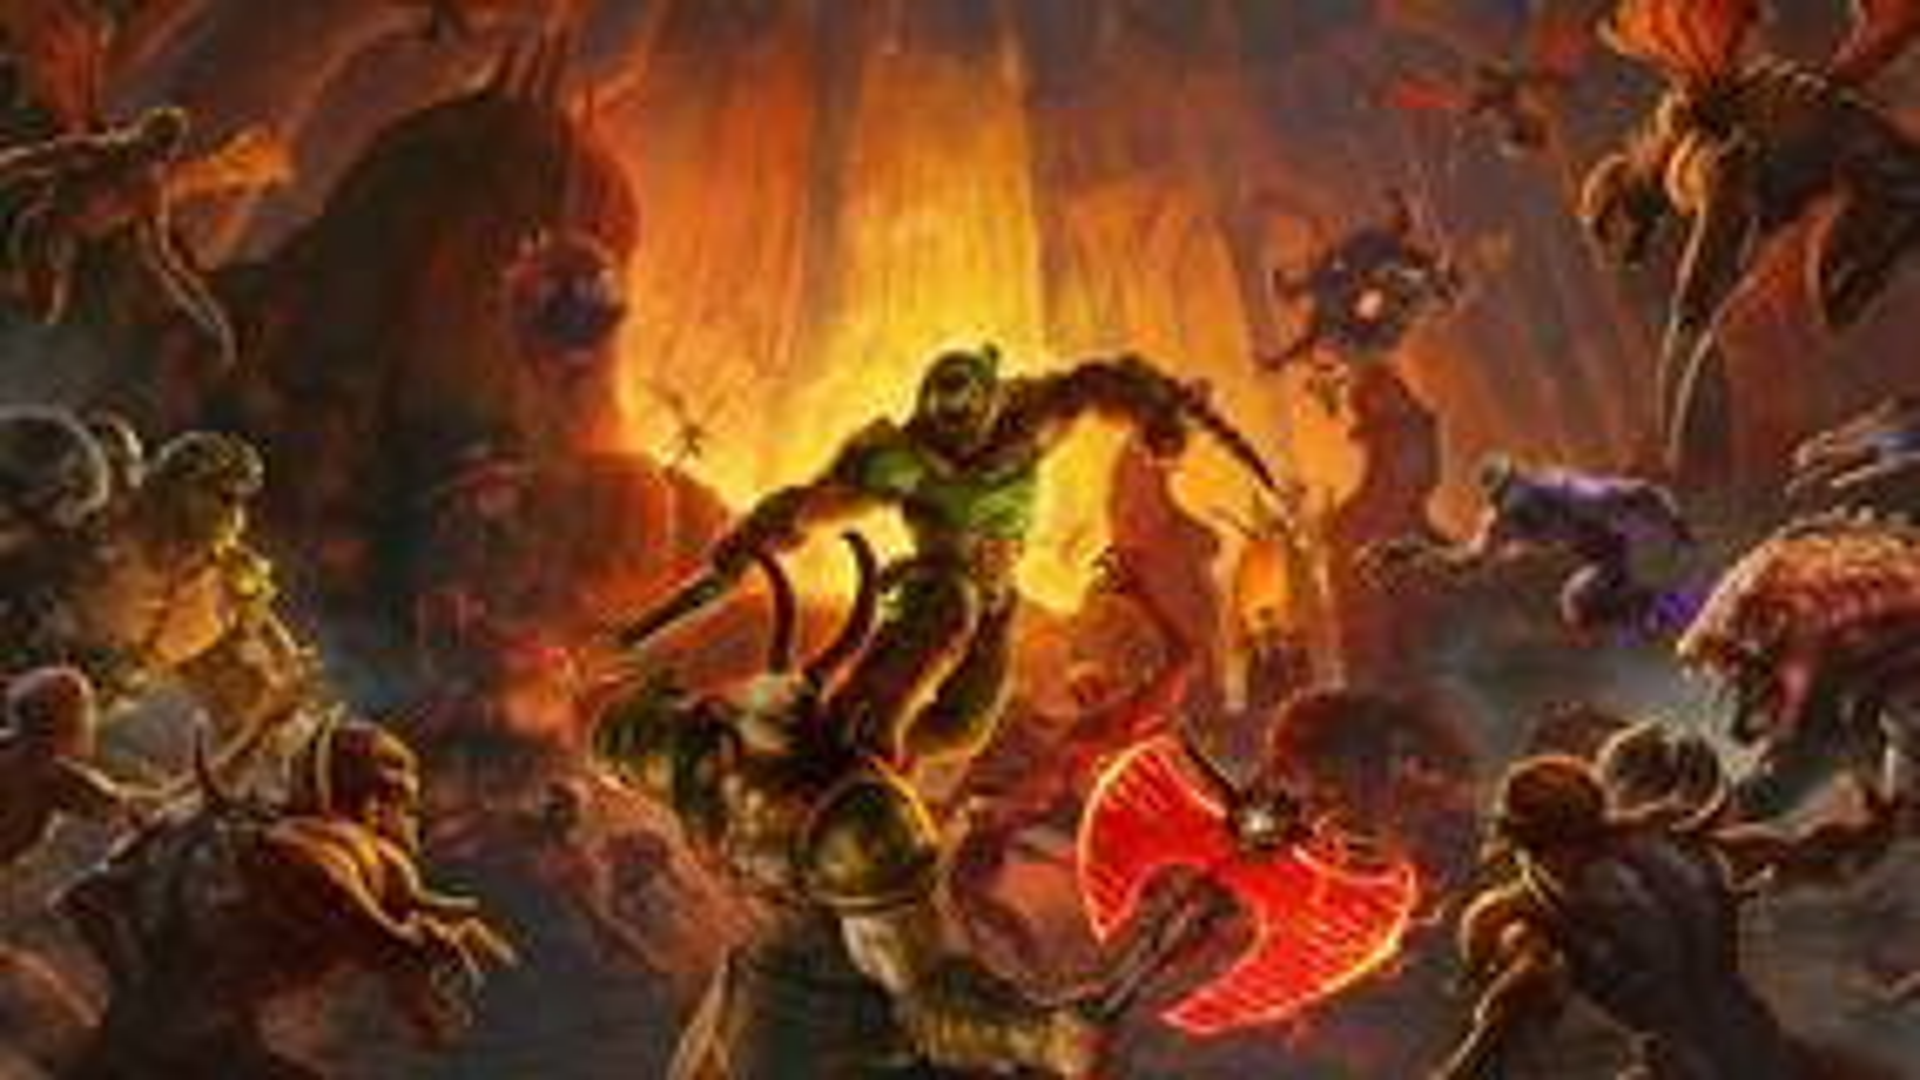 Image for Here's Doom Eternal running at 4K 120fps on an RTX 3080